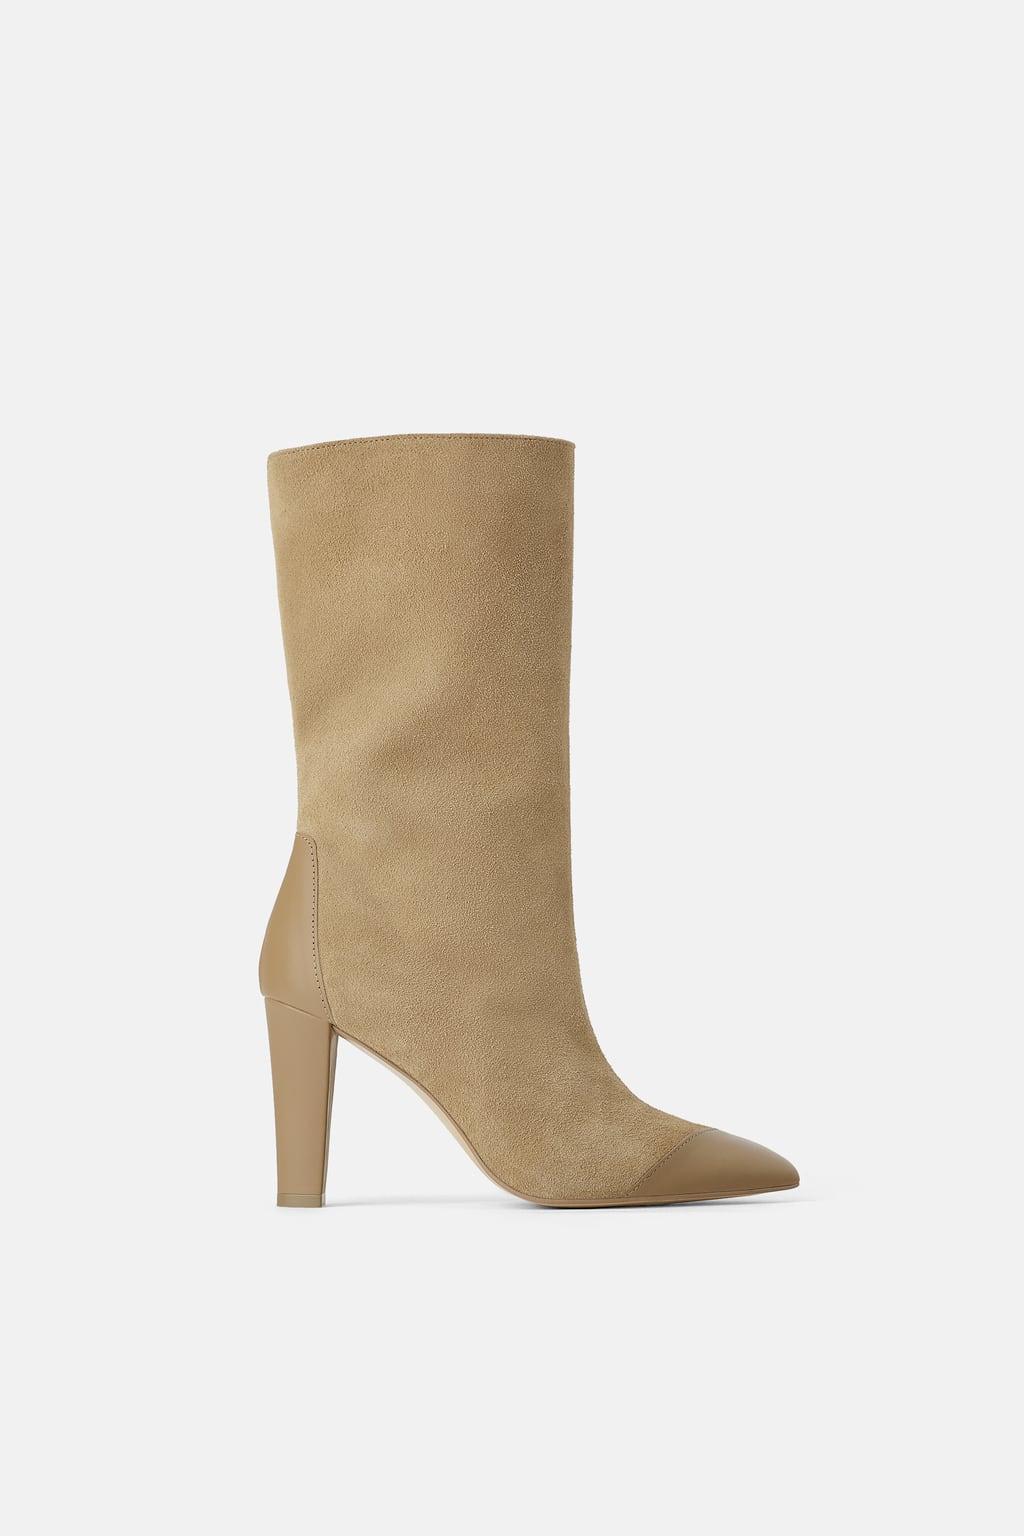 https://www.zara.com/ca/en/split-leather-heeled-ankle-boots-p11105001.html?v1=7886752&v2=1180333